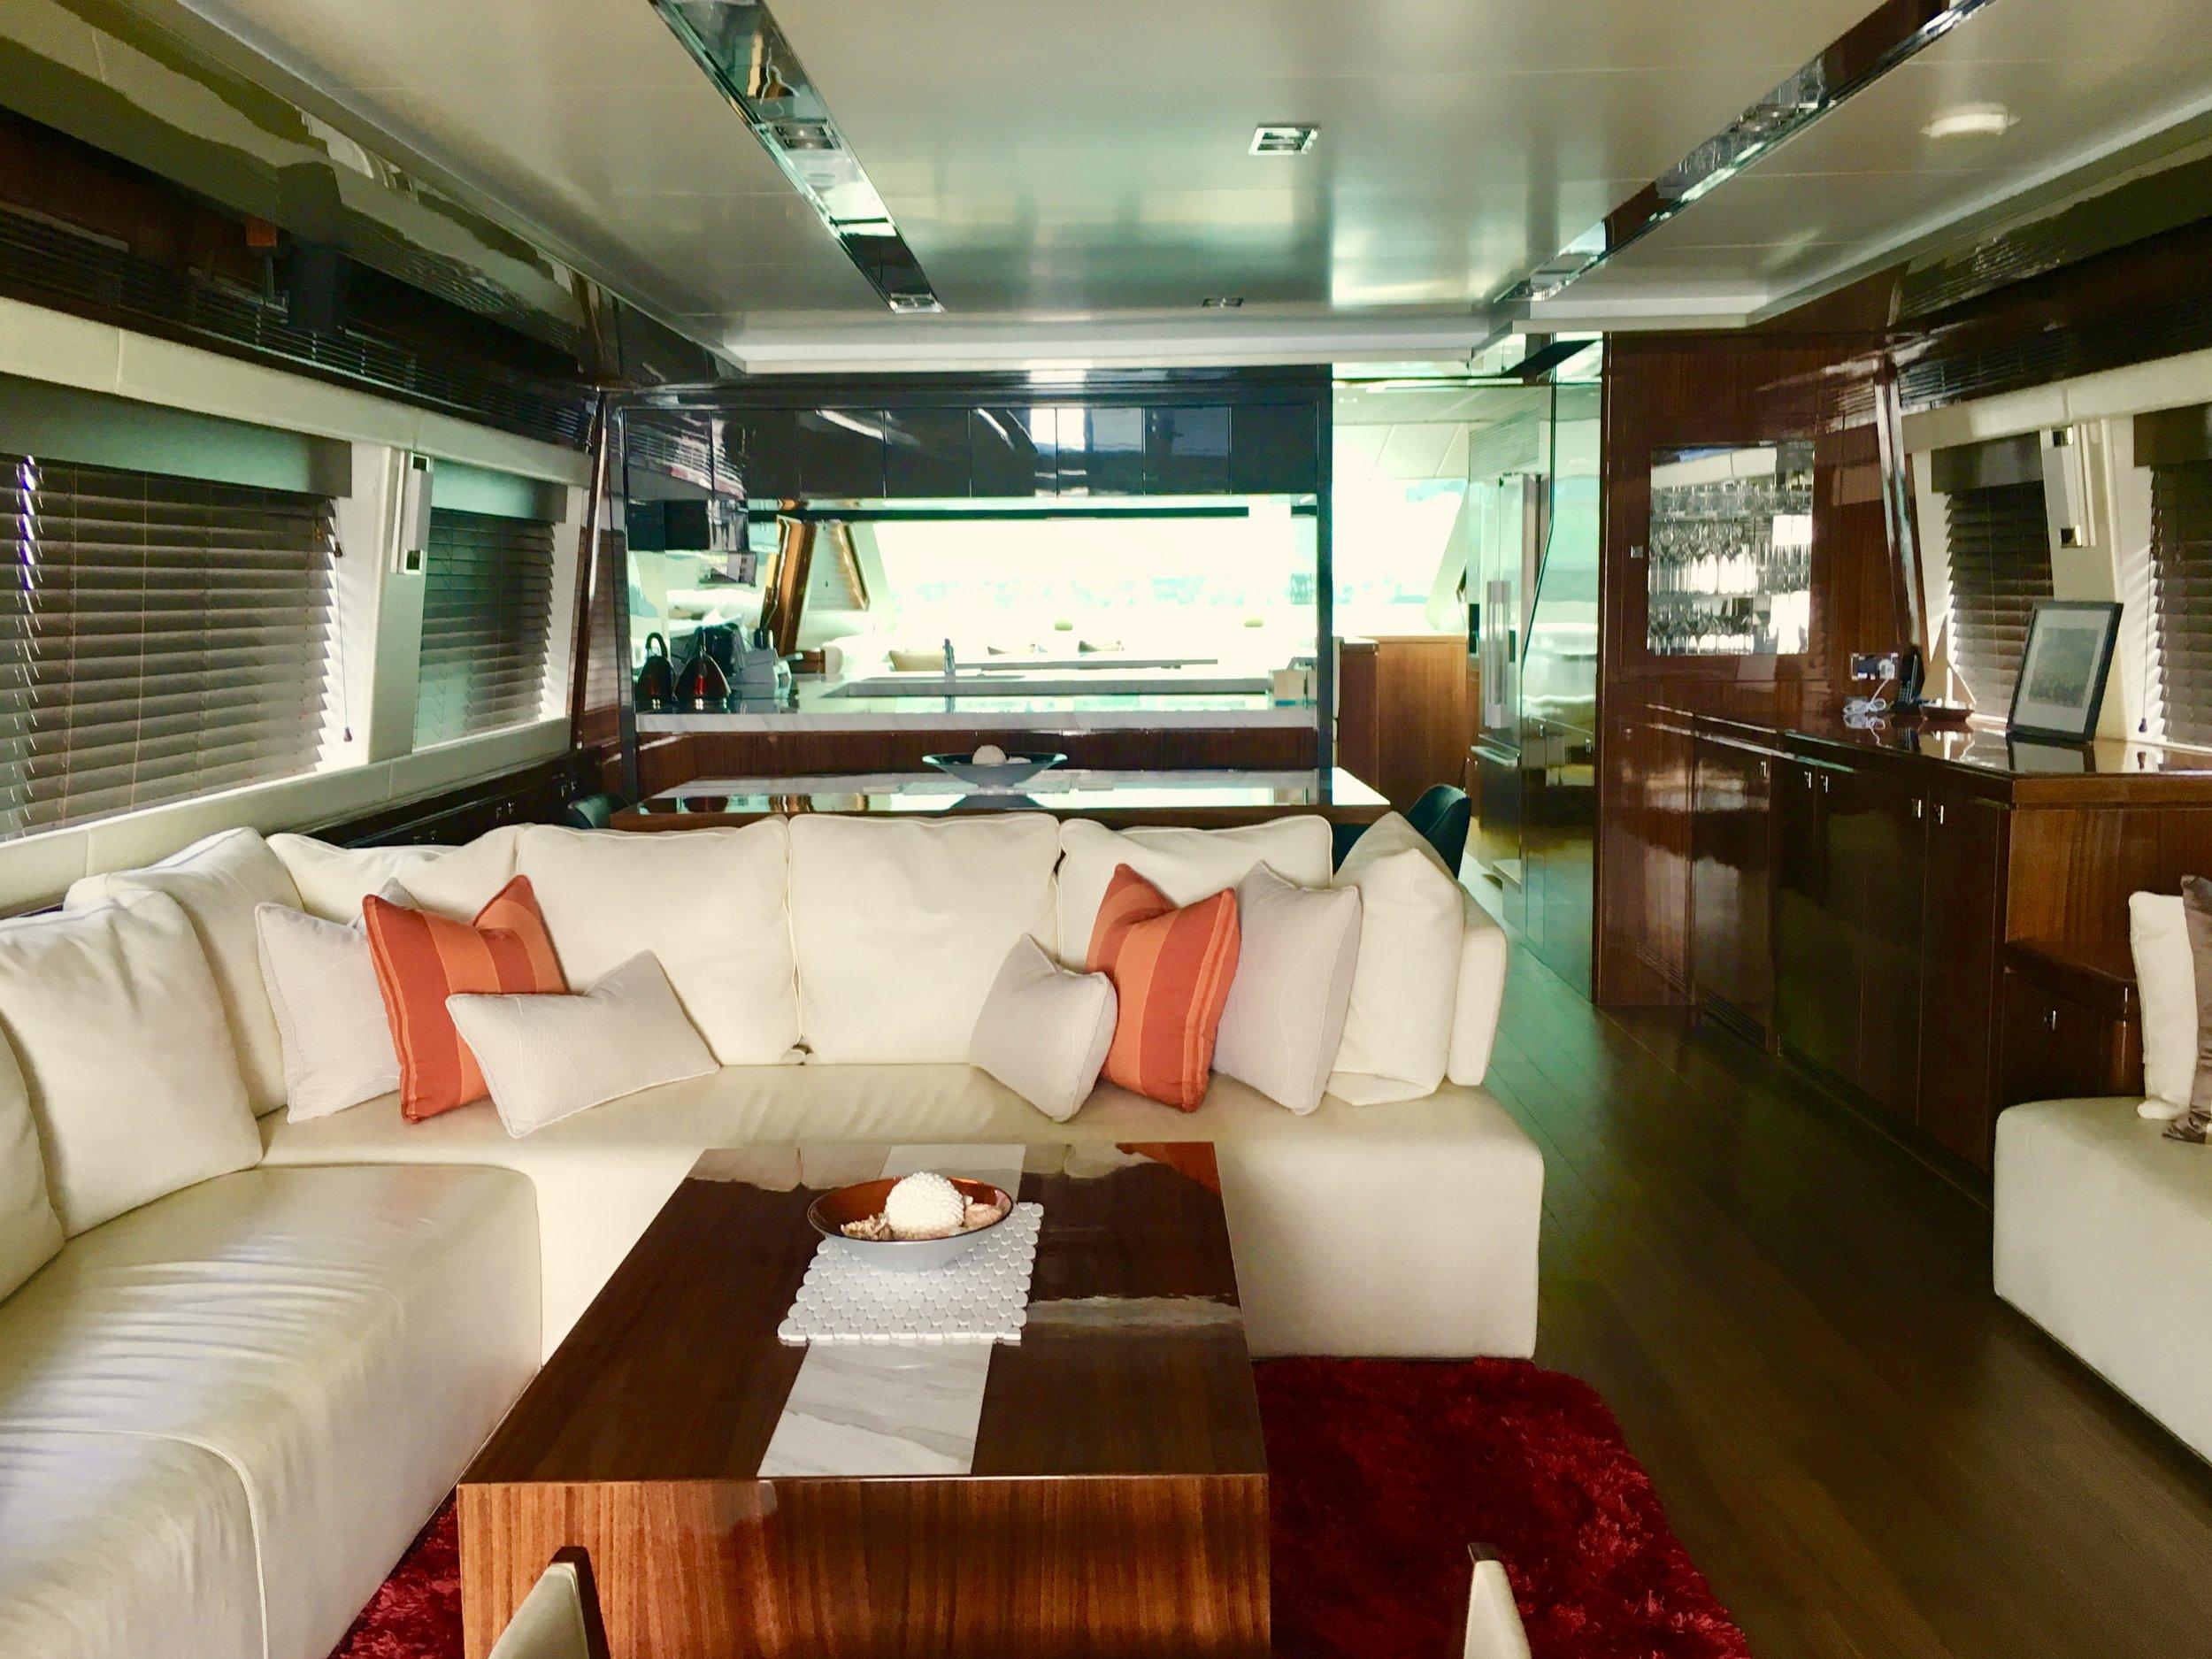 Interior Saloon of Superyacht